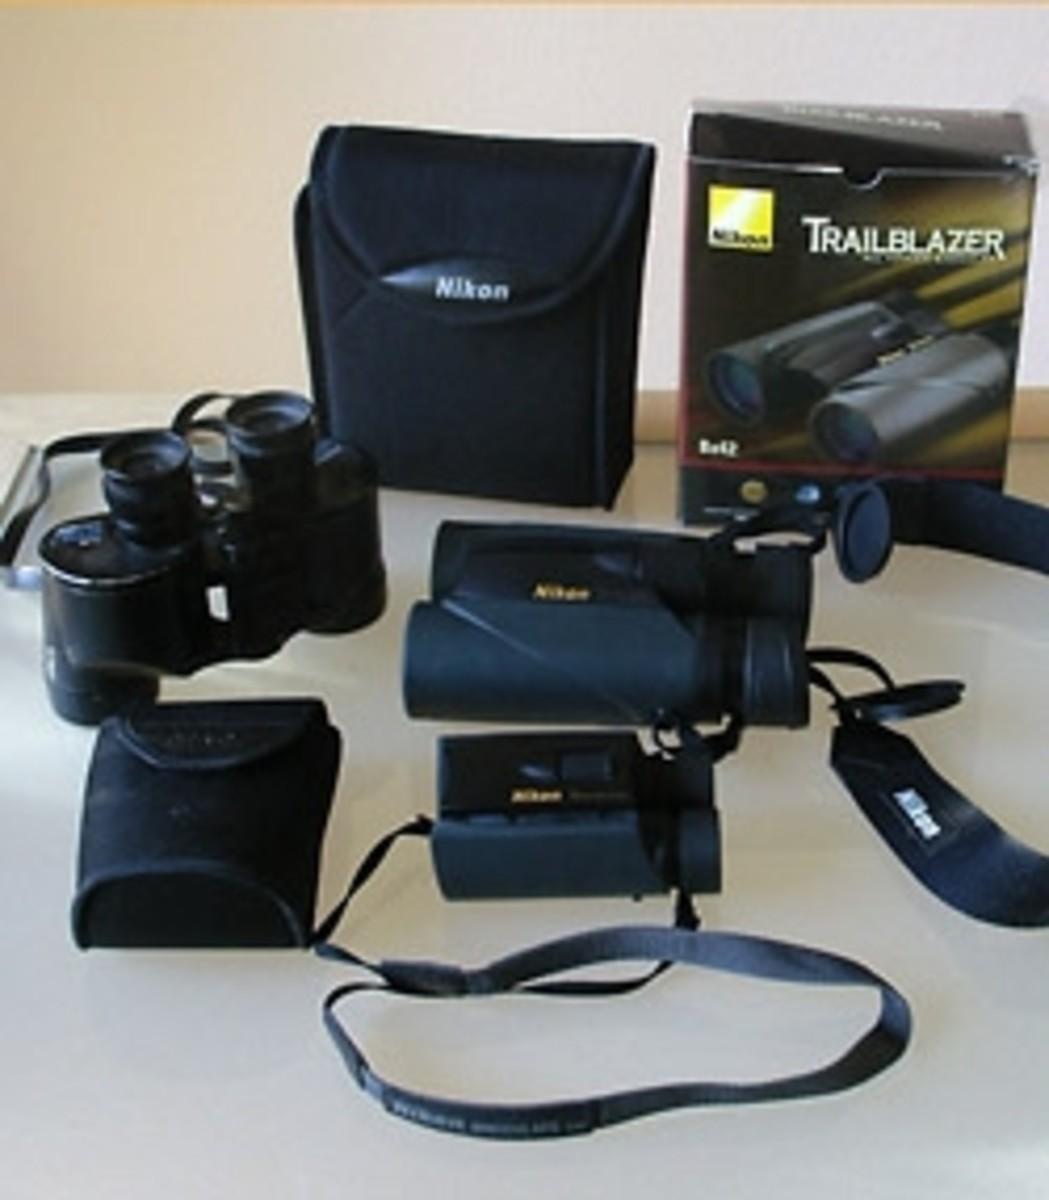 review-nikon-trailblazer-binoculars